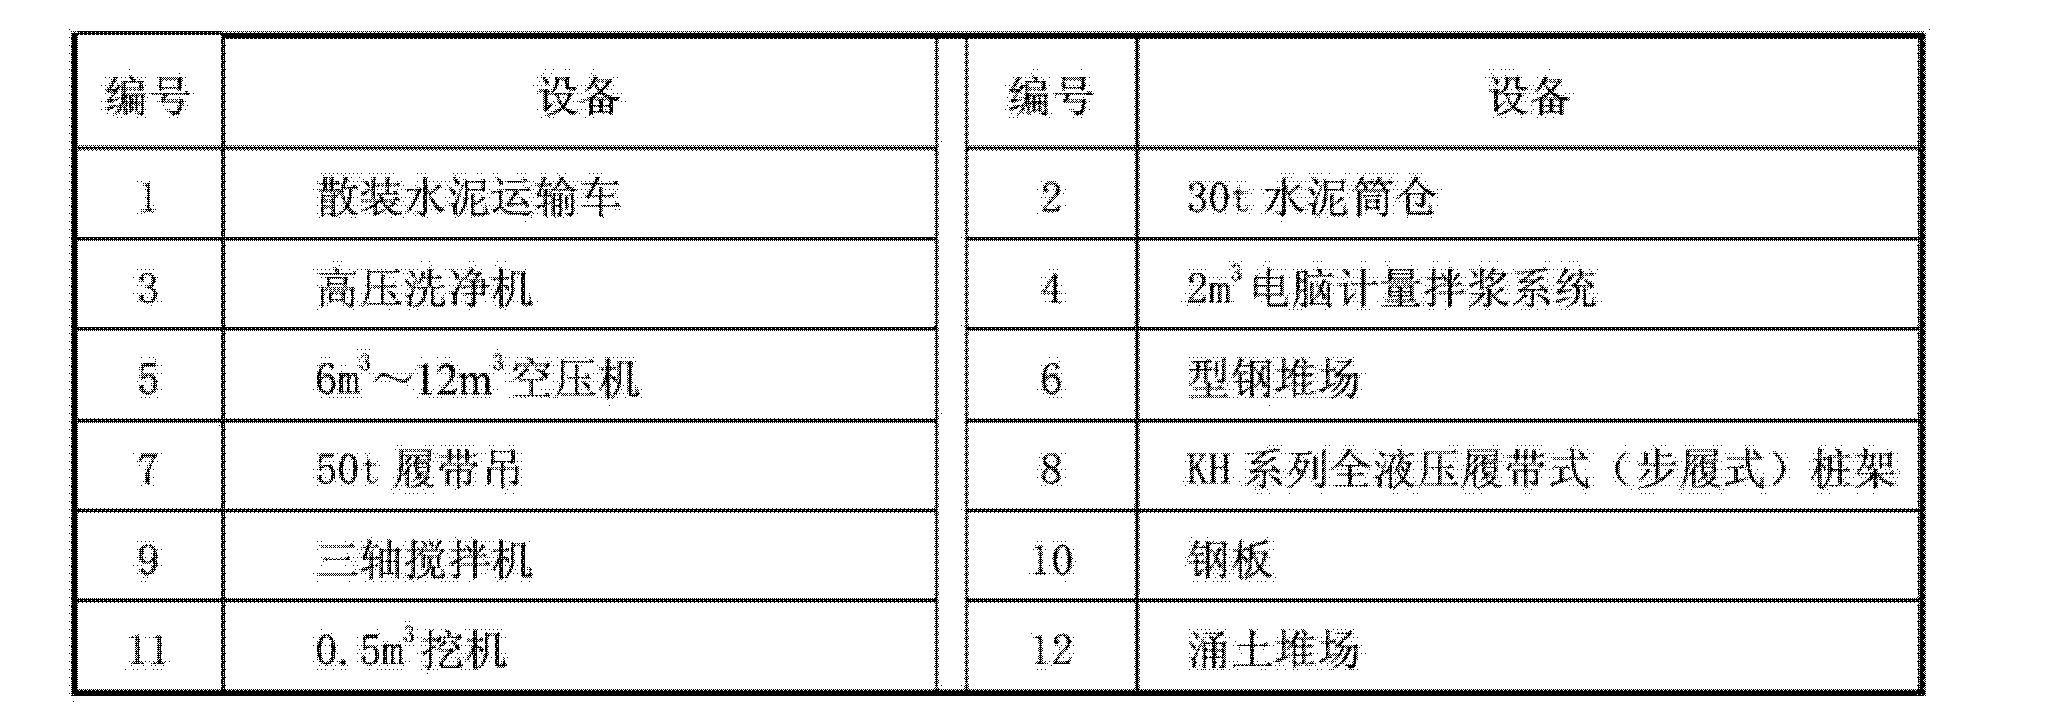 Figure CN203475440UD00051